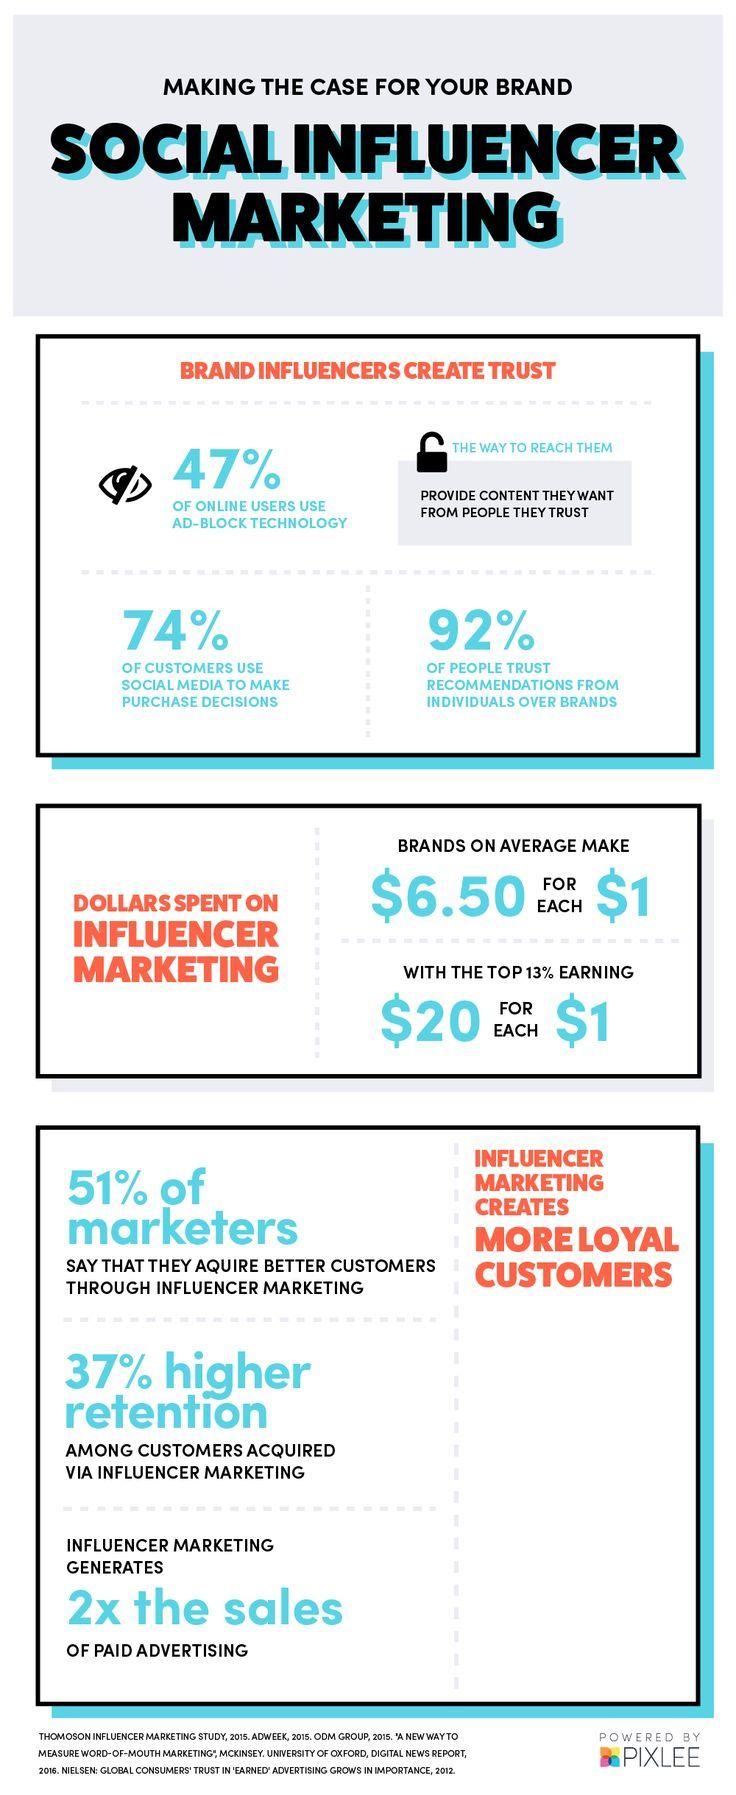 Social media infographic – The Best Influencer Marketing Platform for Finding Instagram Influencers [Infographic]